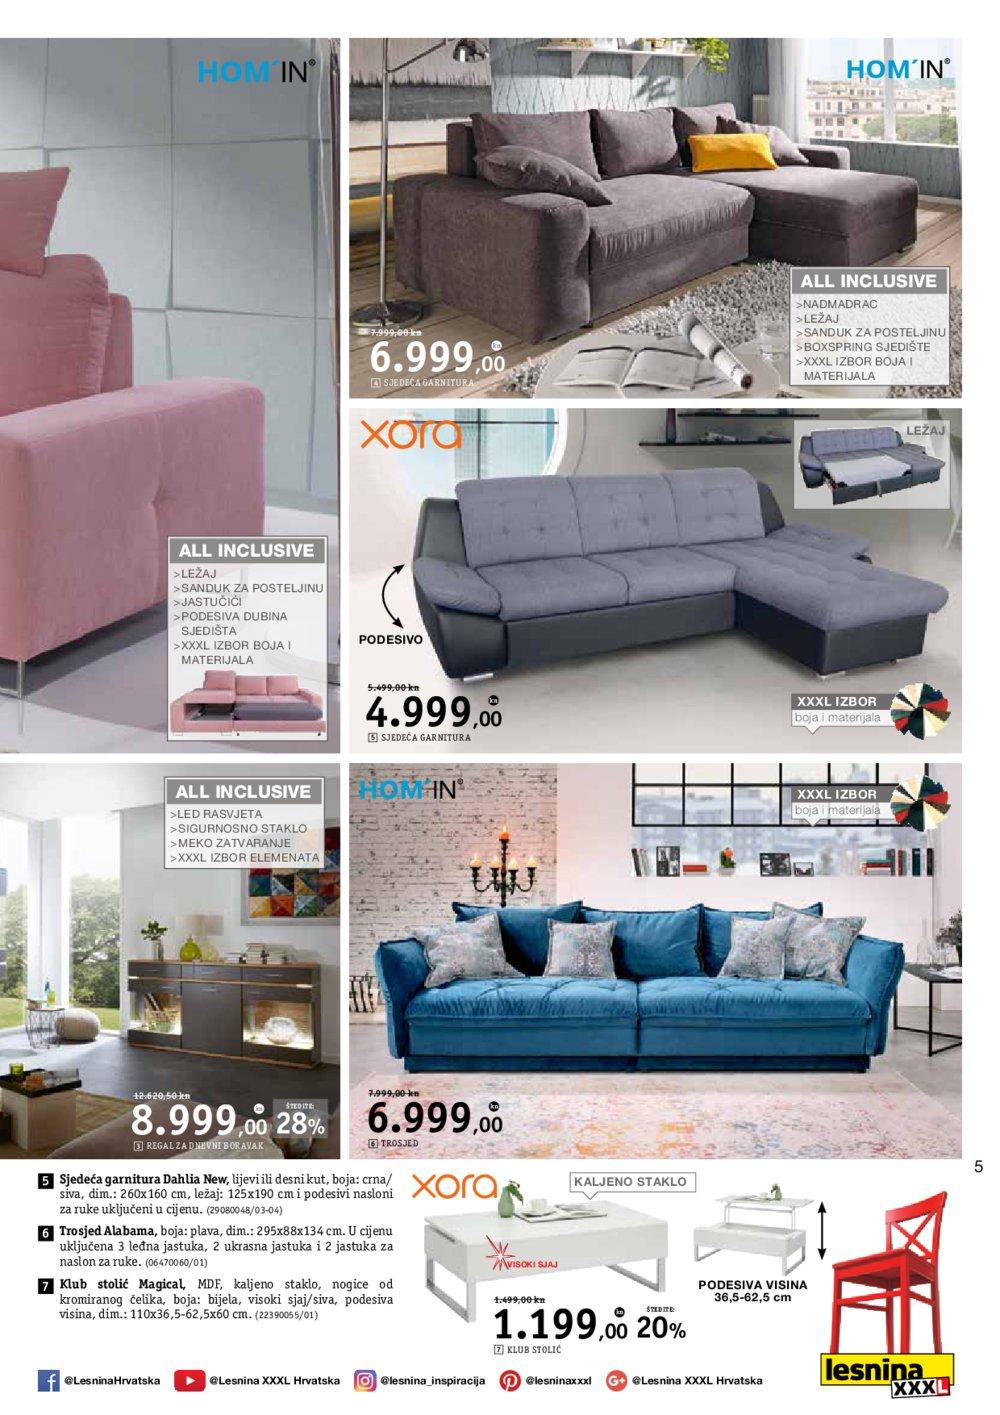 Lesnina katalog La dolce vita 29.05.-13.06.2018.